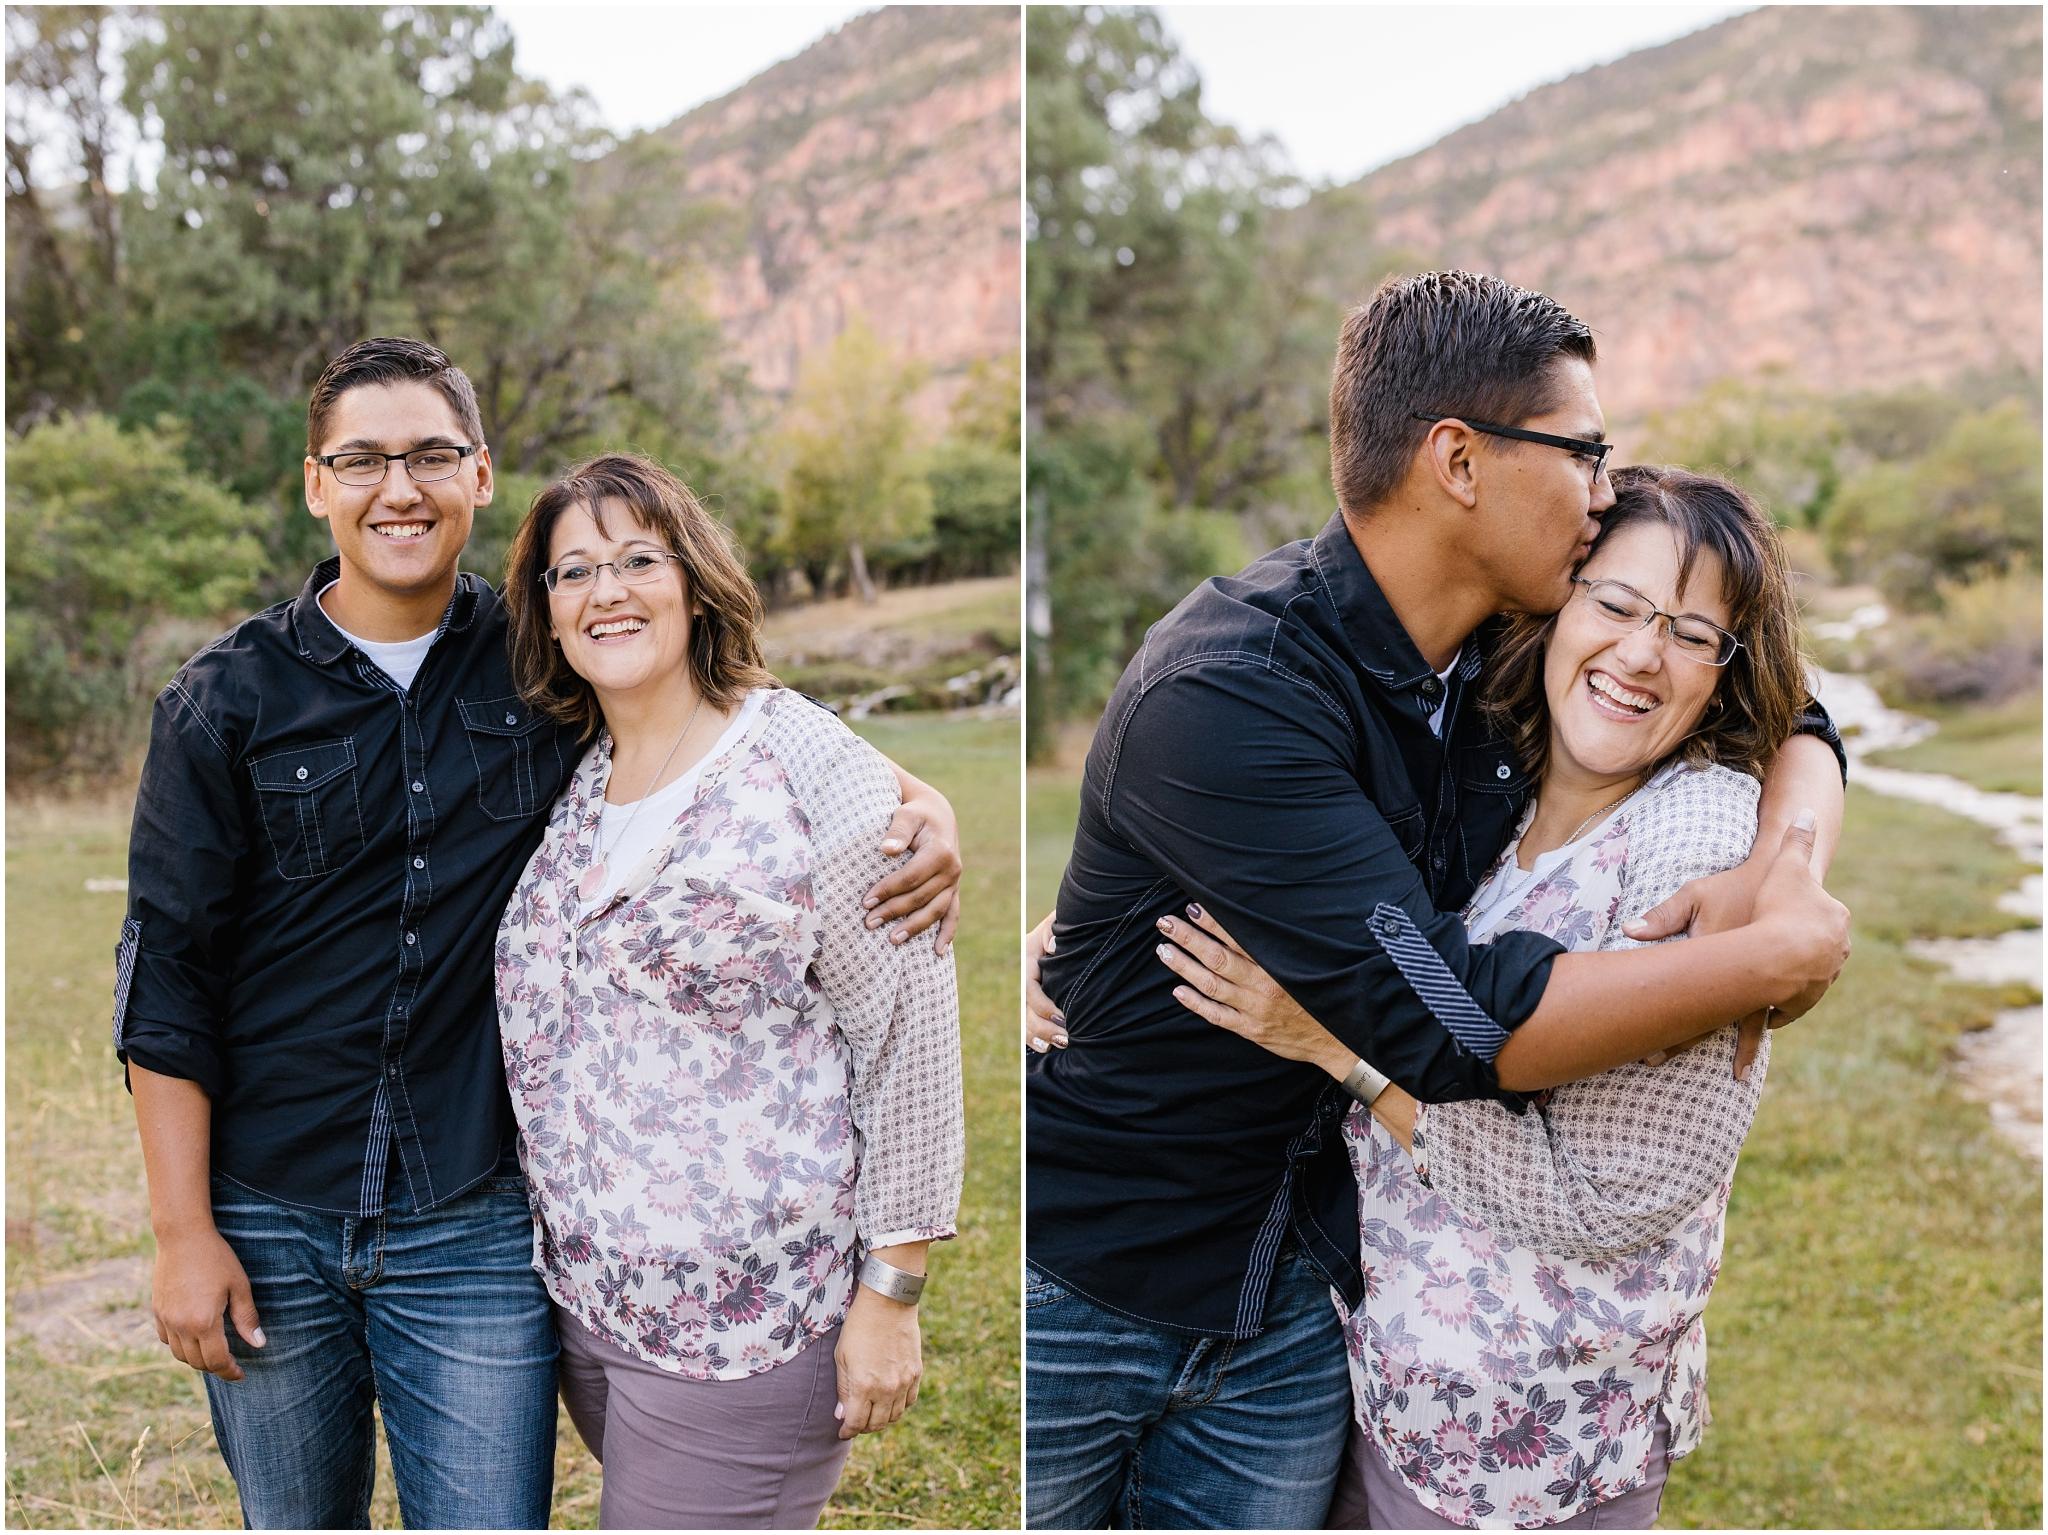 Hatch-54_Lizzie-B-Imagery-Utah-Family-Photographer-Park-City-Salt-Lake-City-Utah-County.jpg